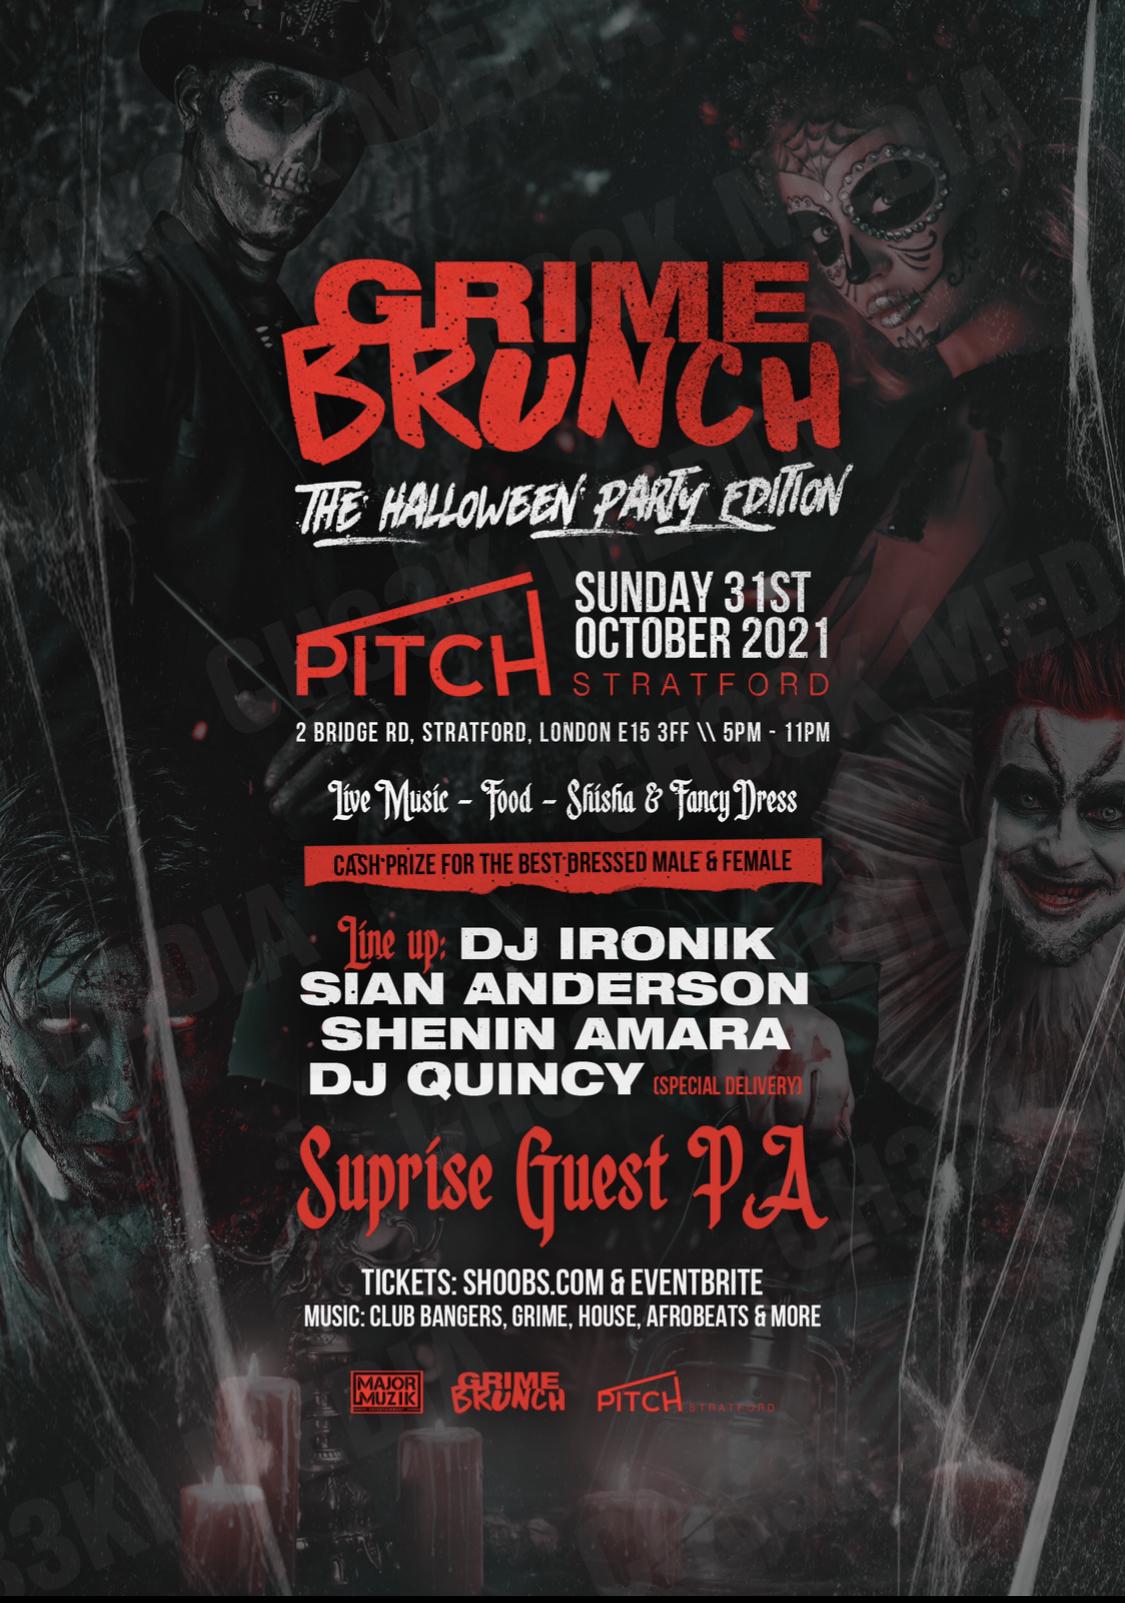 Grime Brunch - Halloween Party